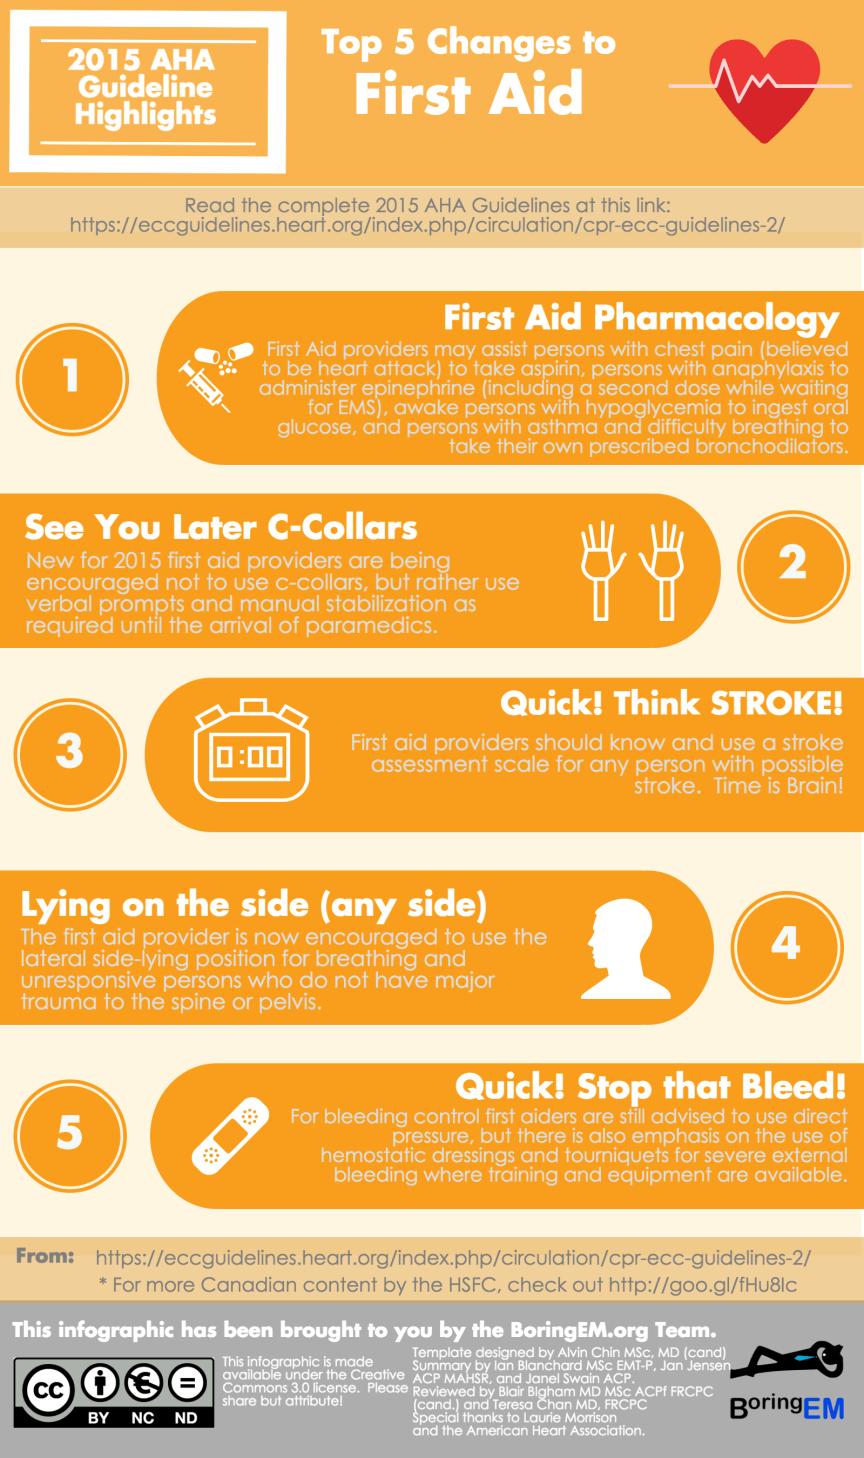 First Aid 2015 AHA update